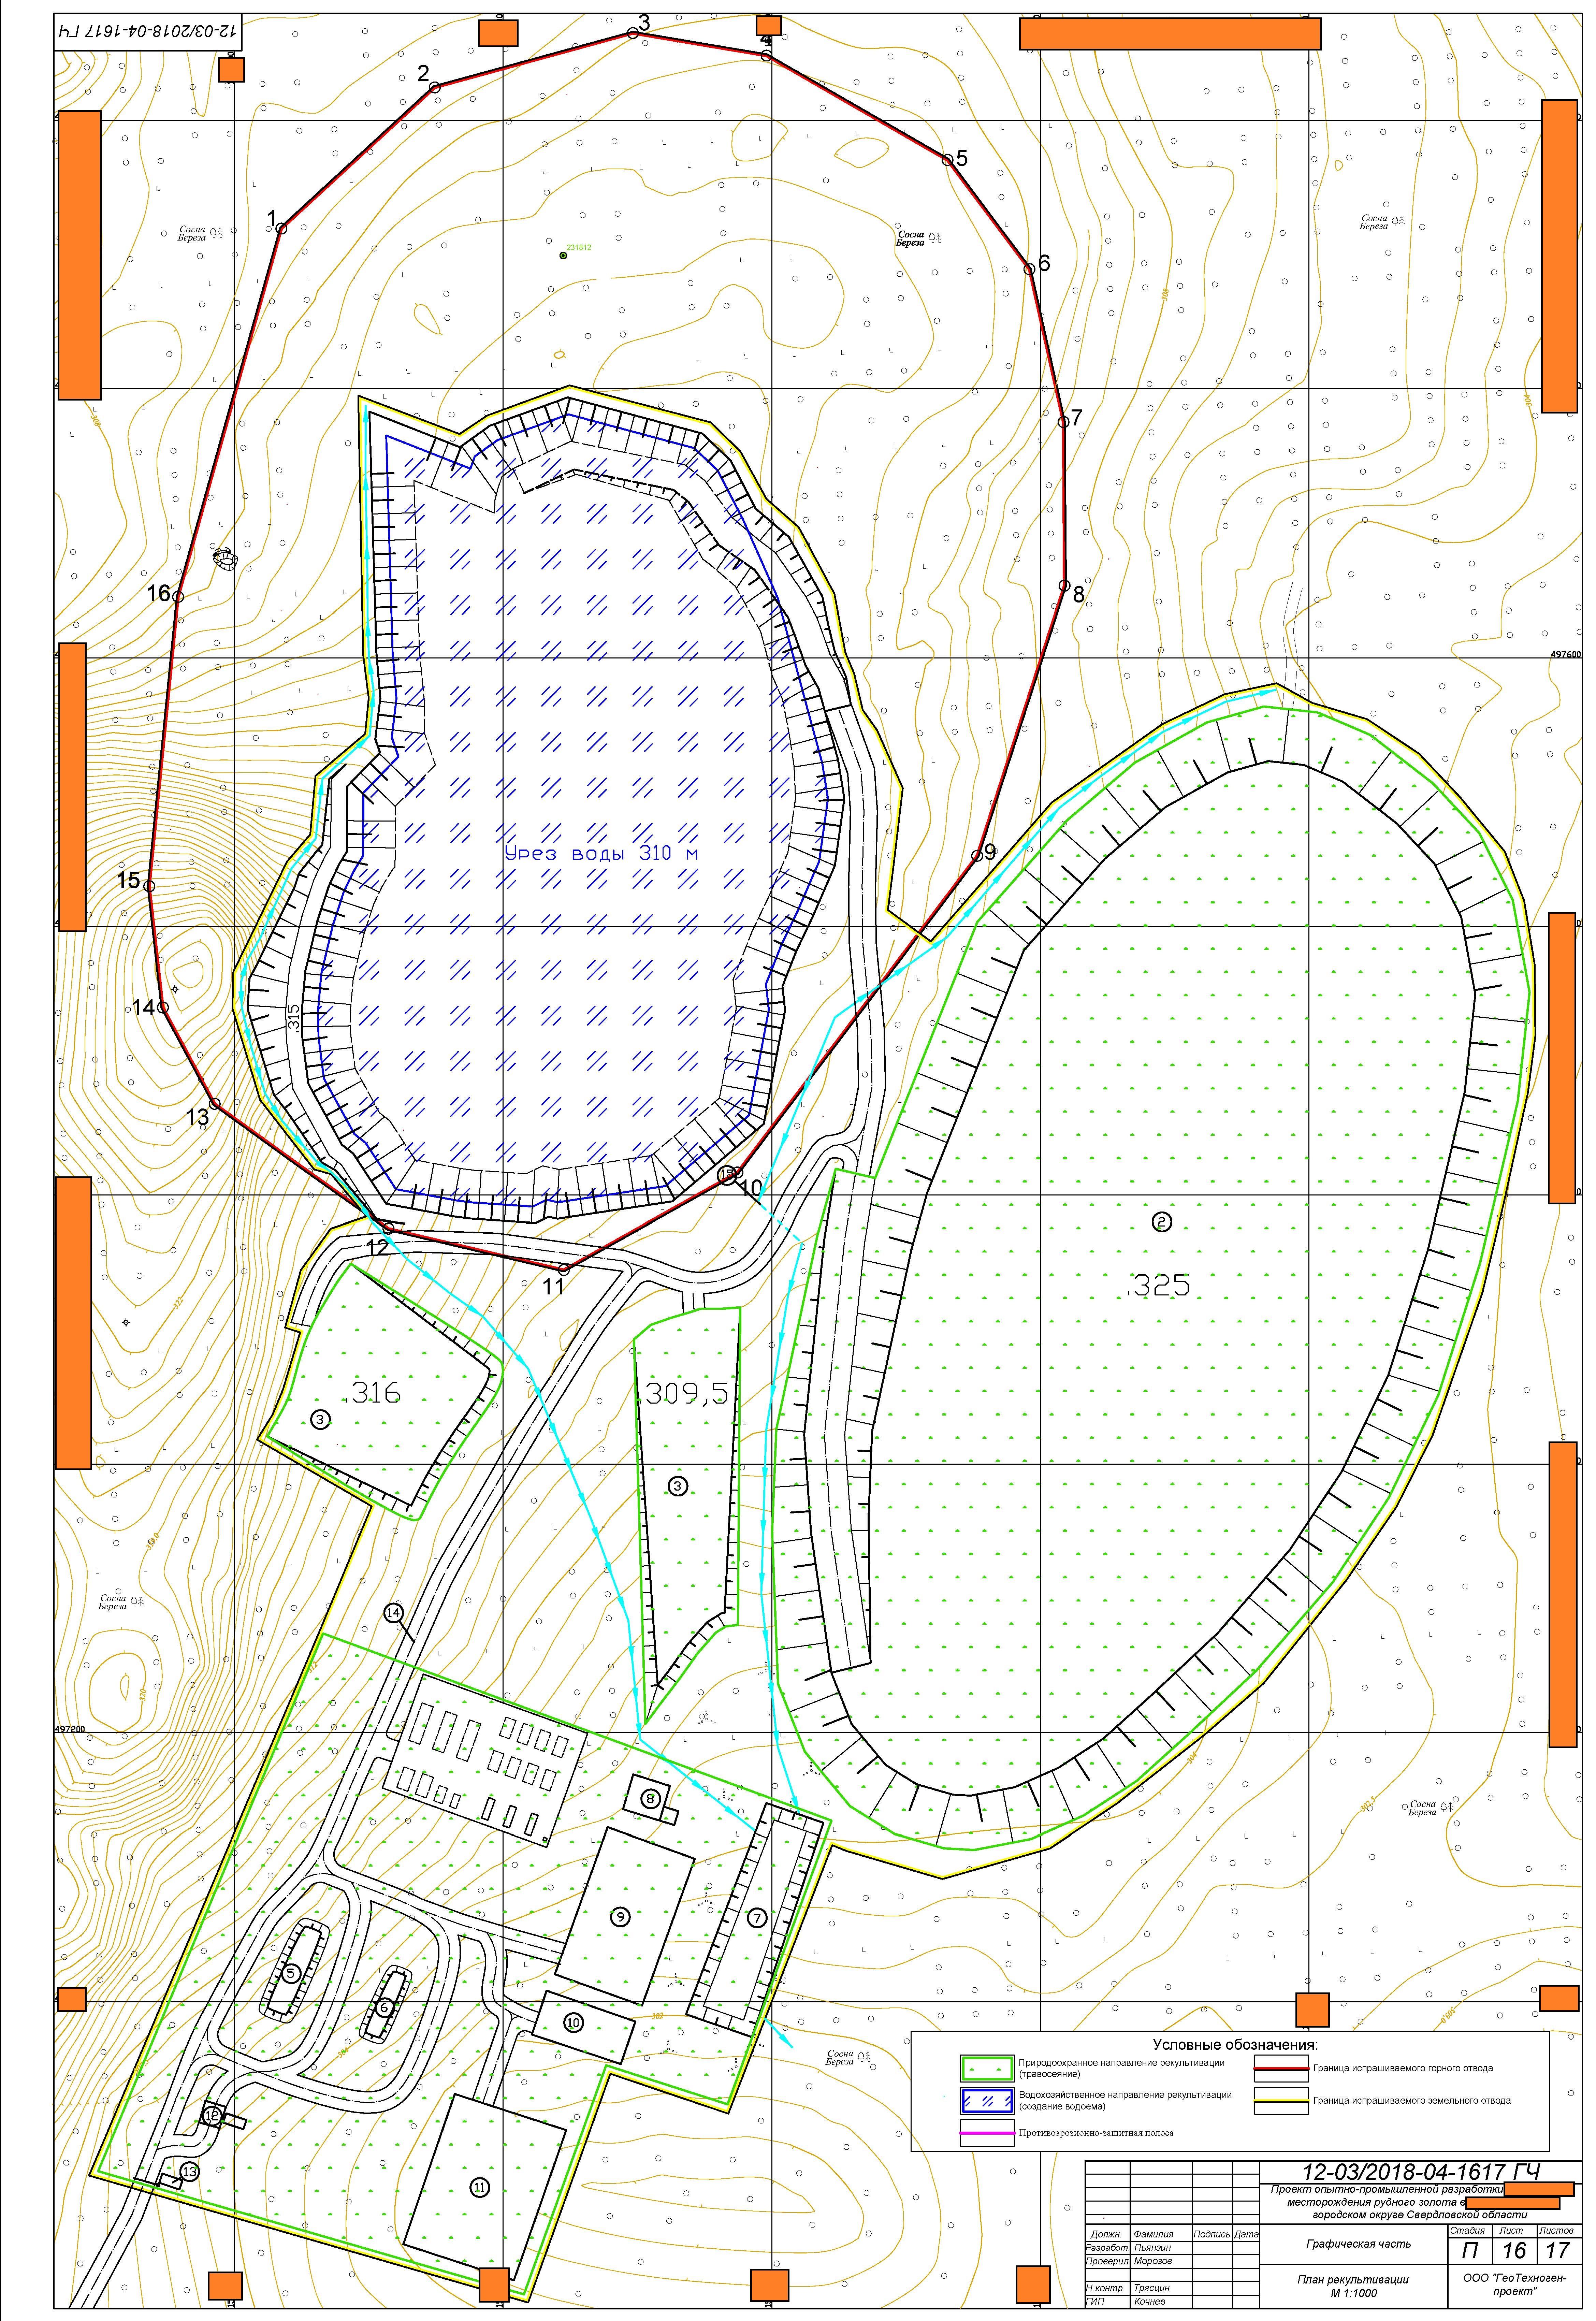 Проект рекультивации (консервации) земель